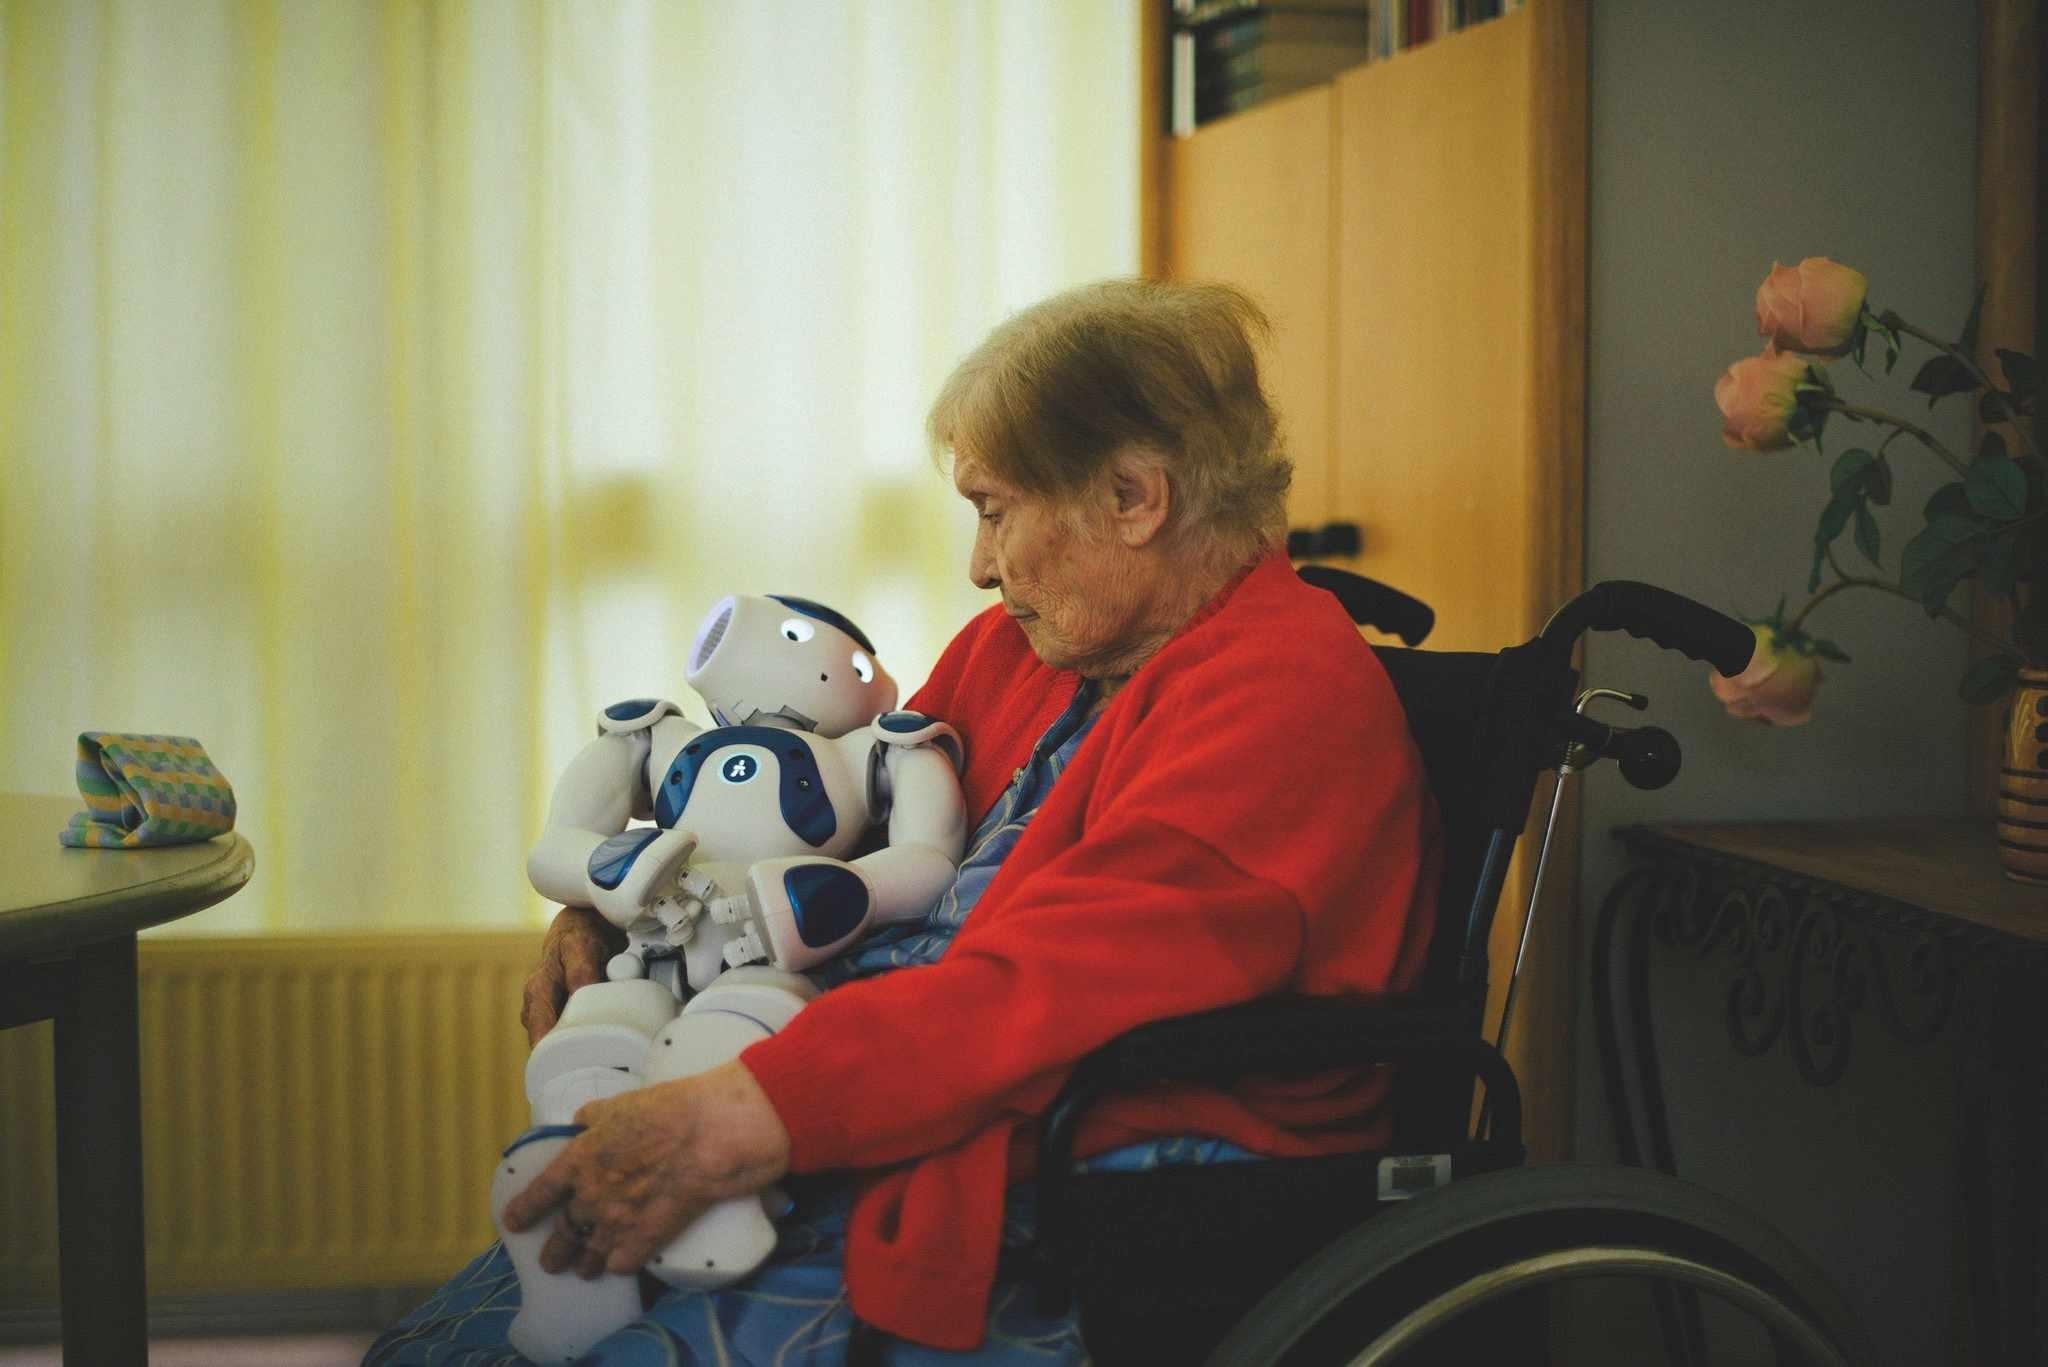 Zora the Robot Care-giver - Dmitry Kostyukov